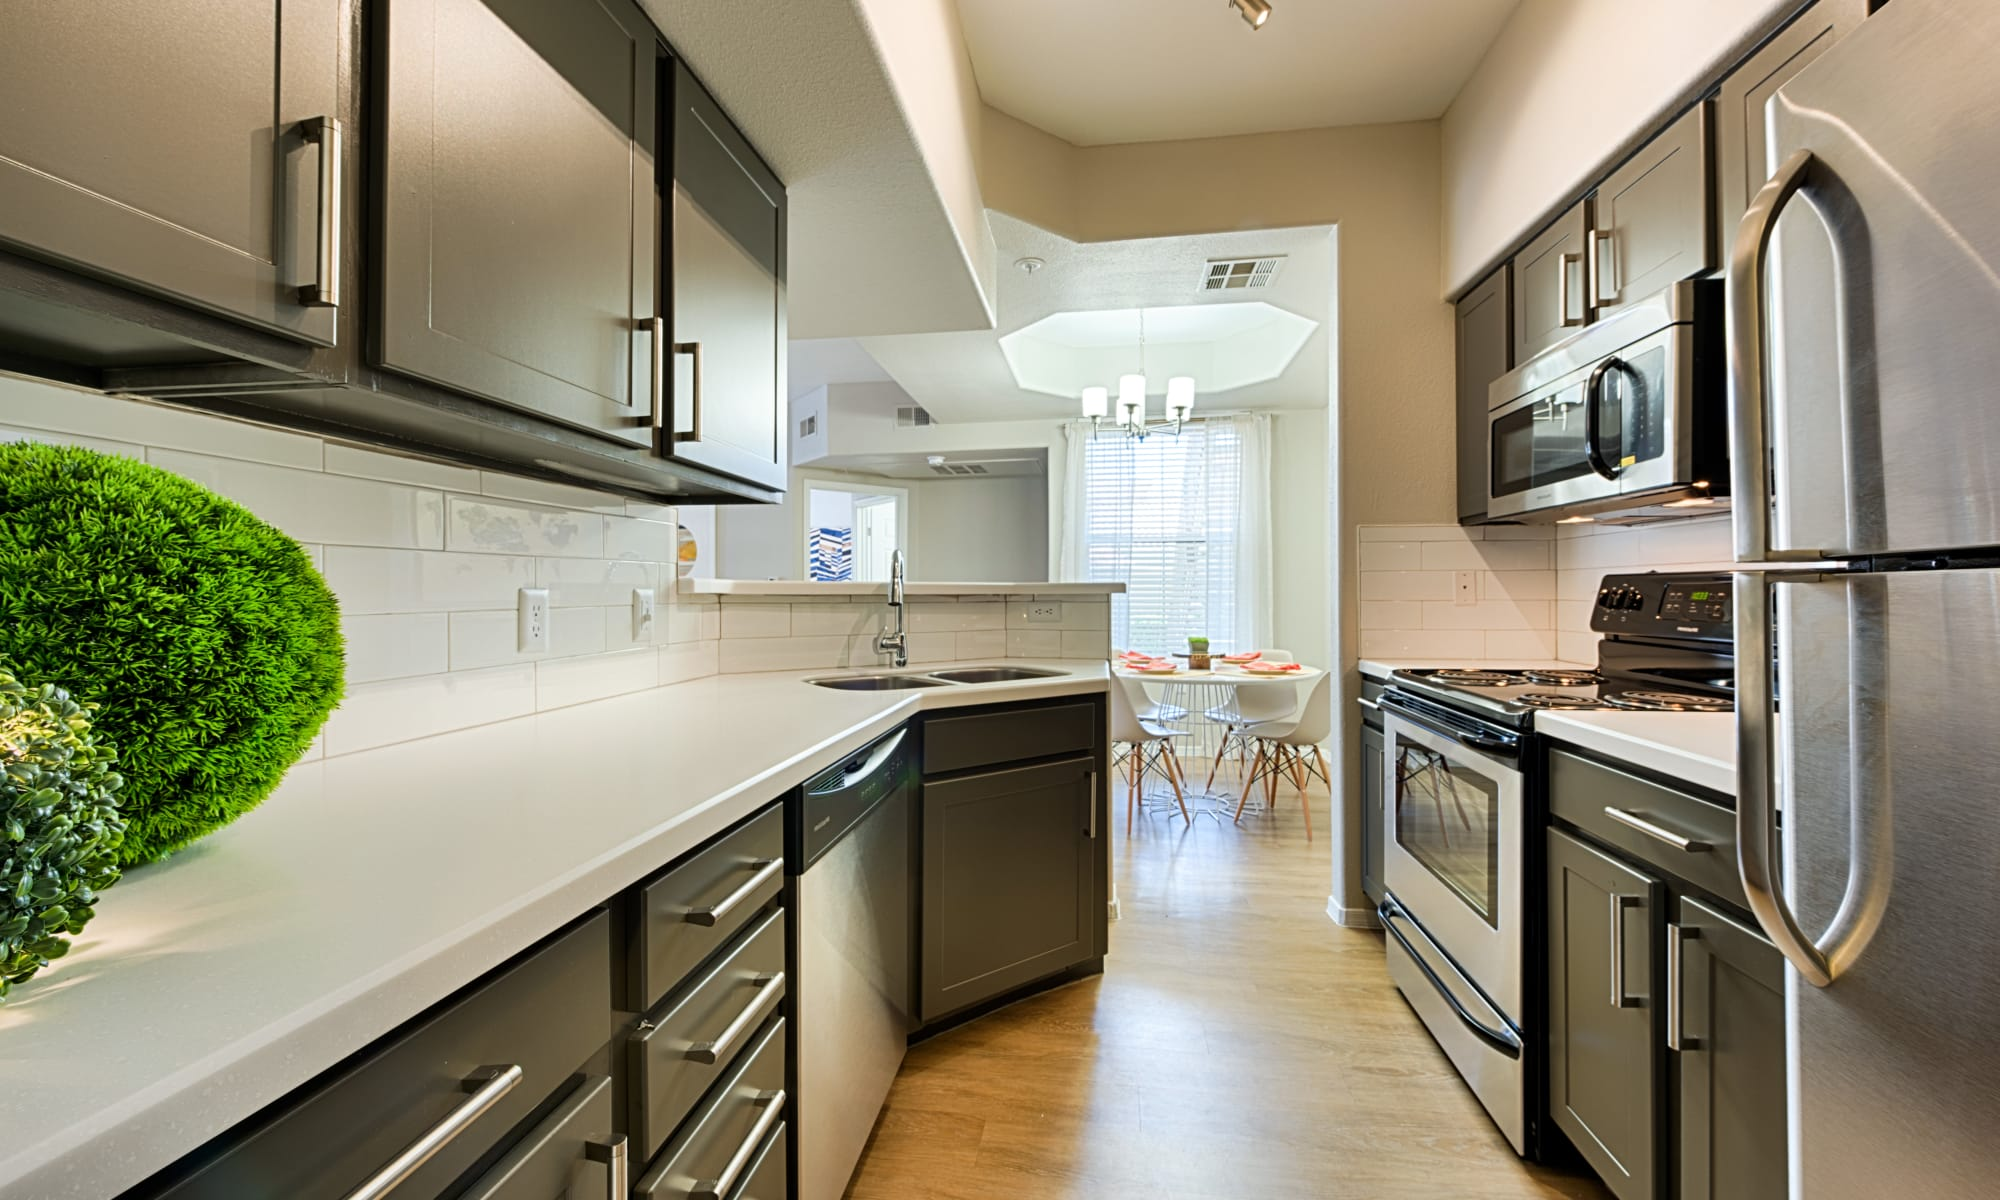 Sonoran Vista Apartments in Scottsdale, Arizona